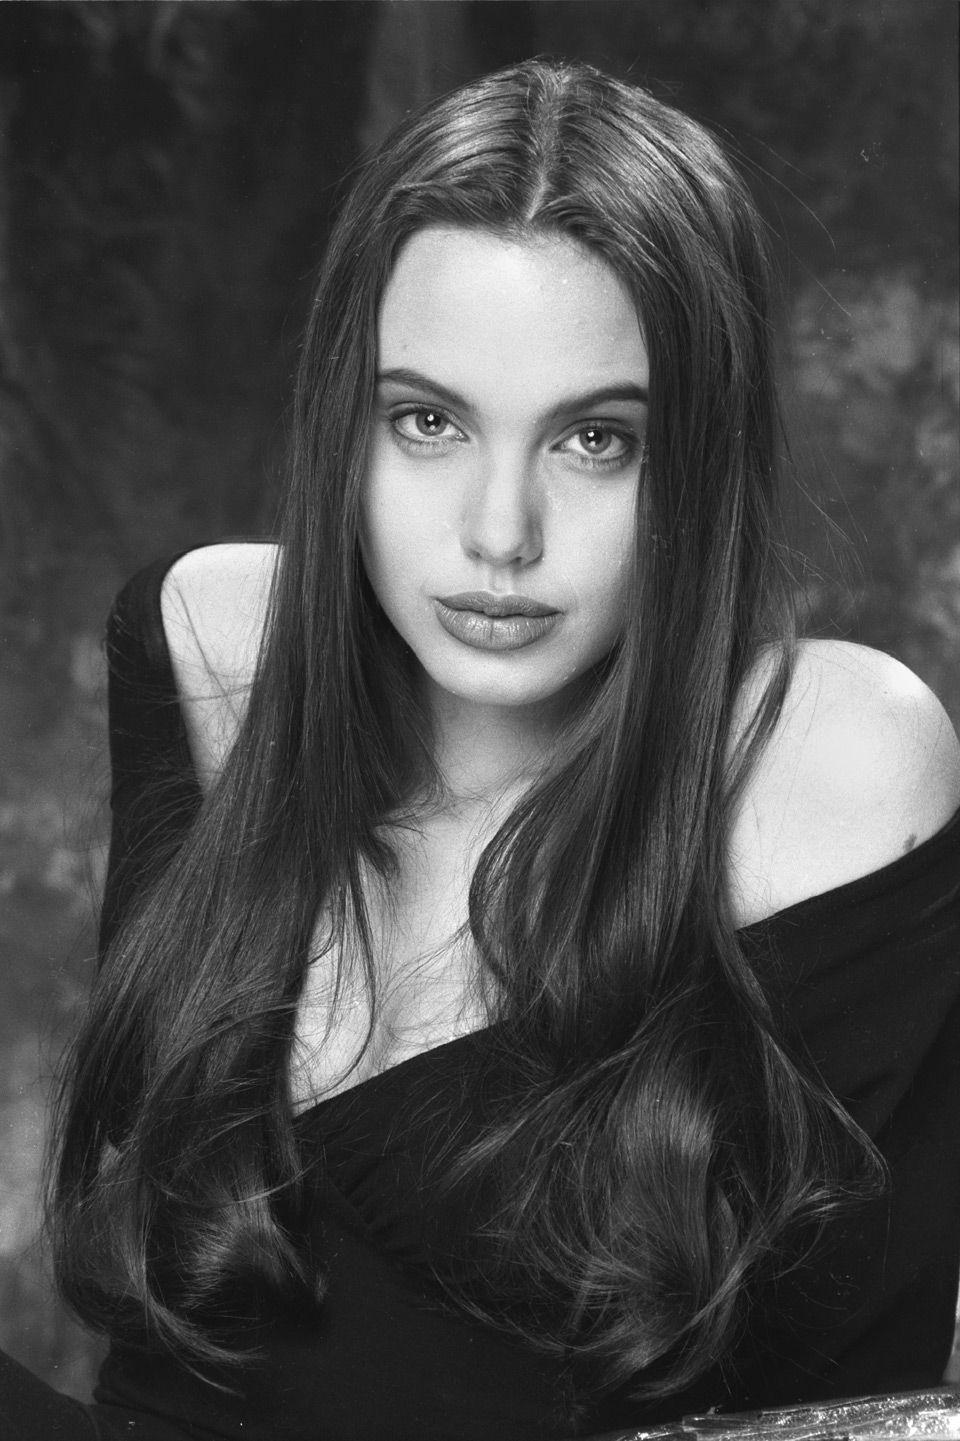 1991 г., Анджелине Джоли 16 лет (Фото: Philip Wong)